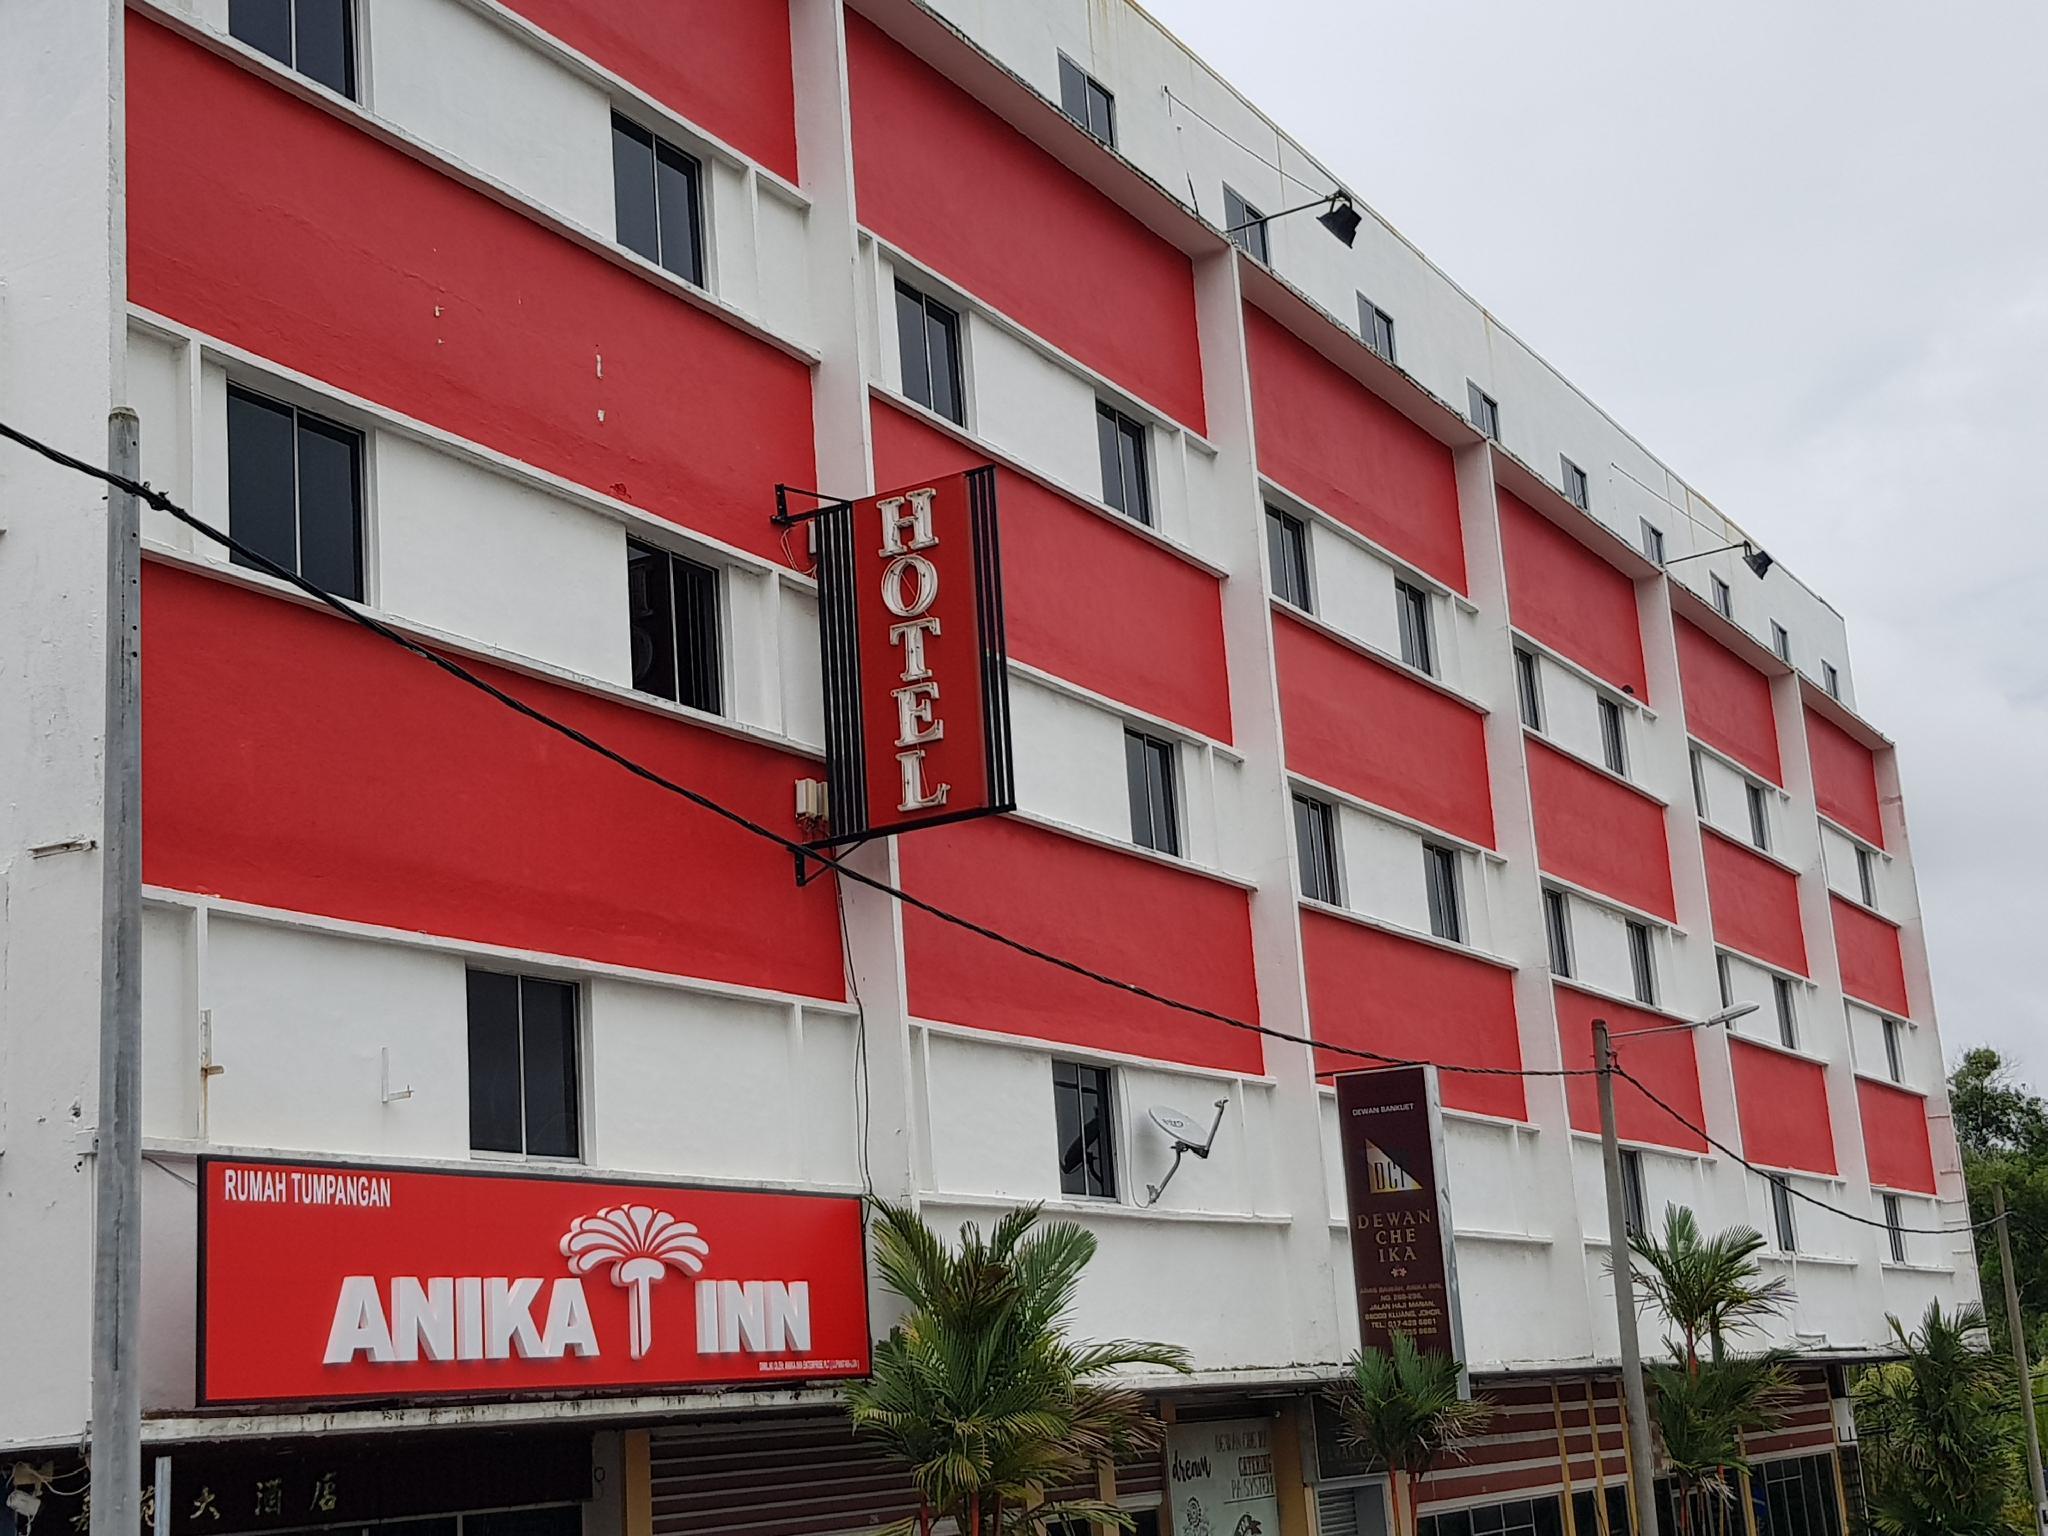 Anika Inn